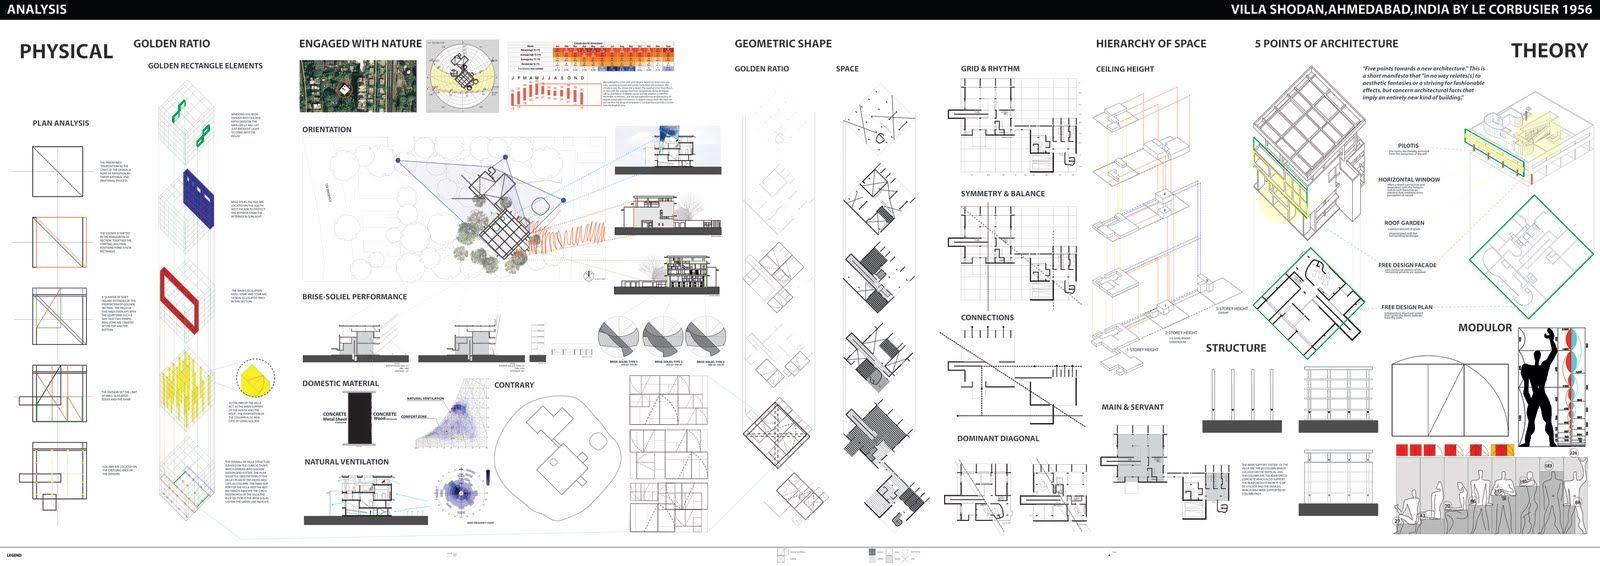 Project 1 2 Villa Shodan And Project 1 3 Villa Shodan And Eshrick